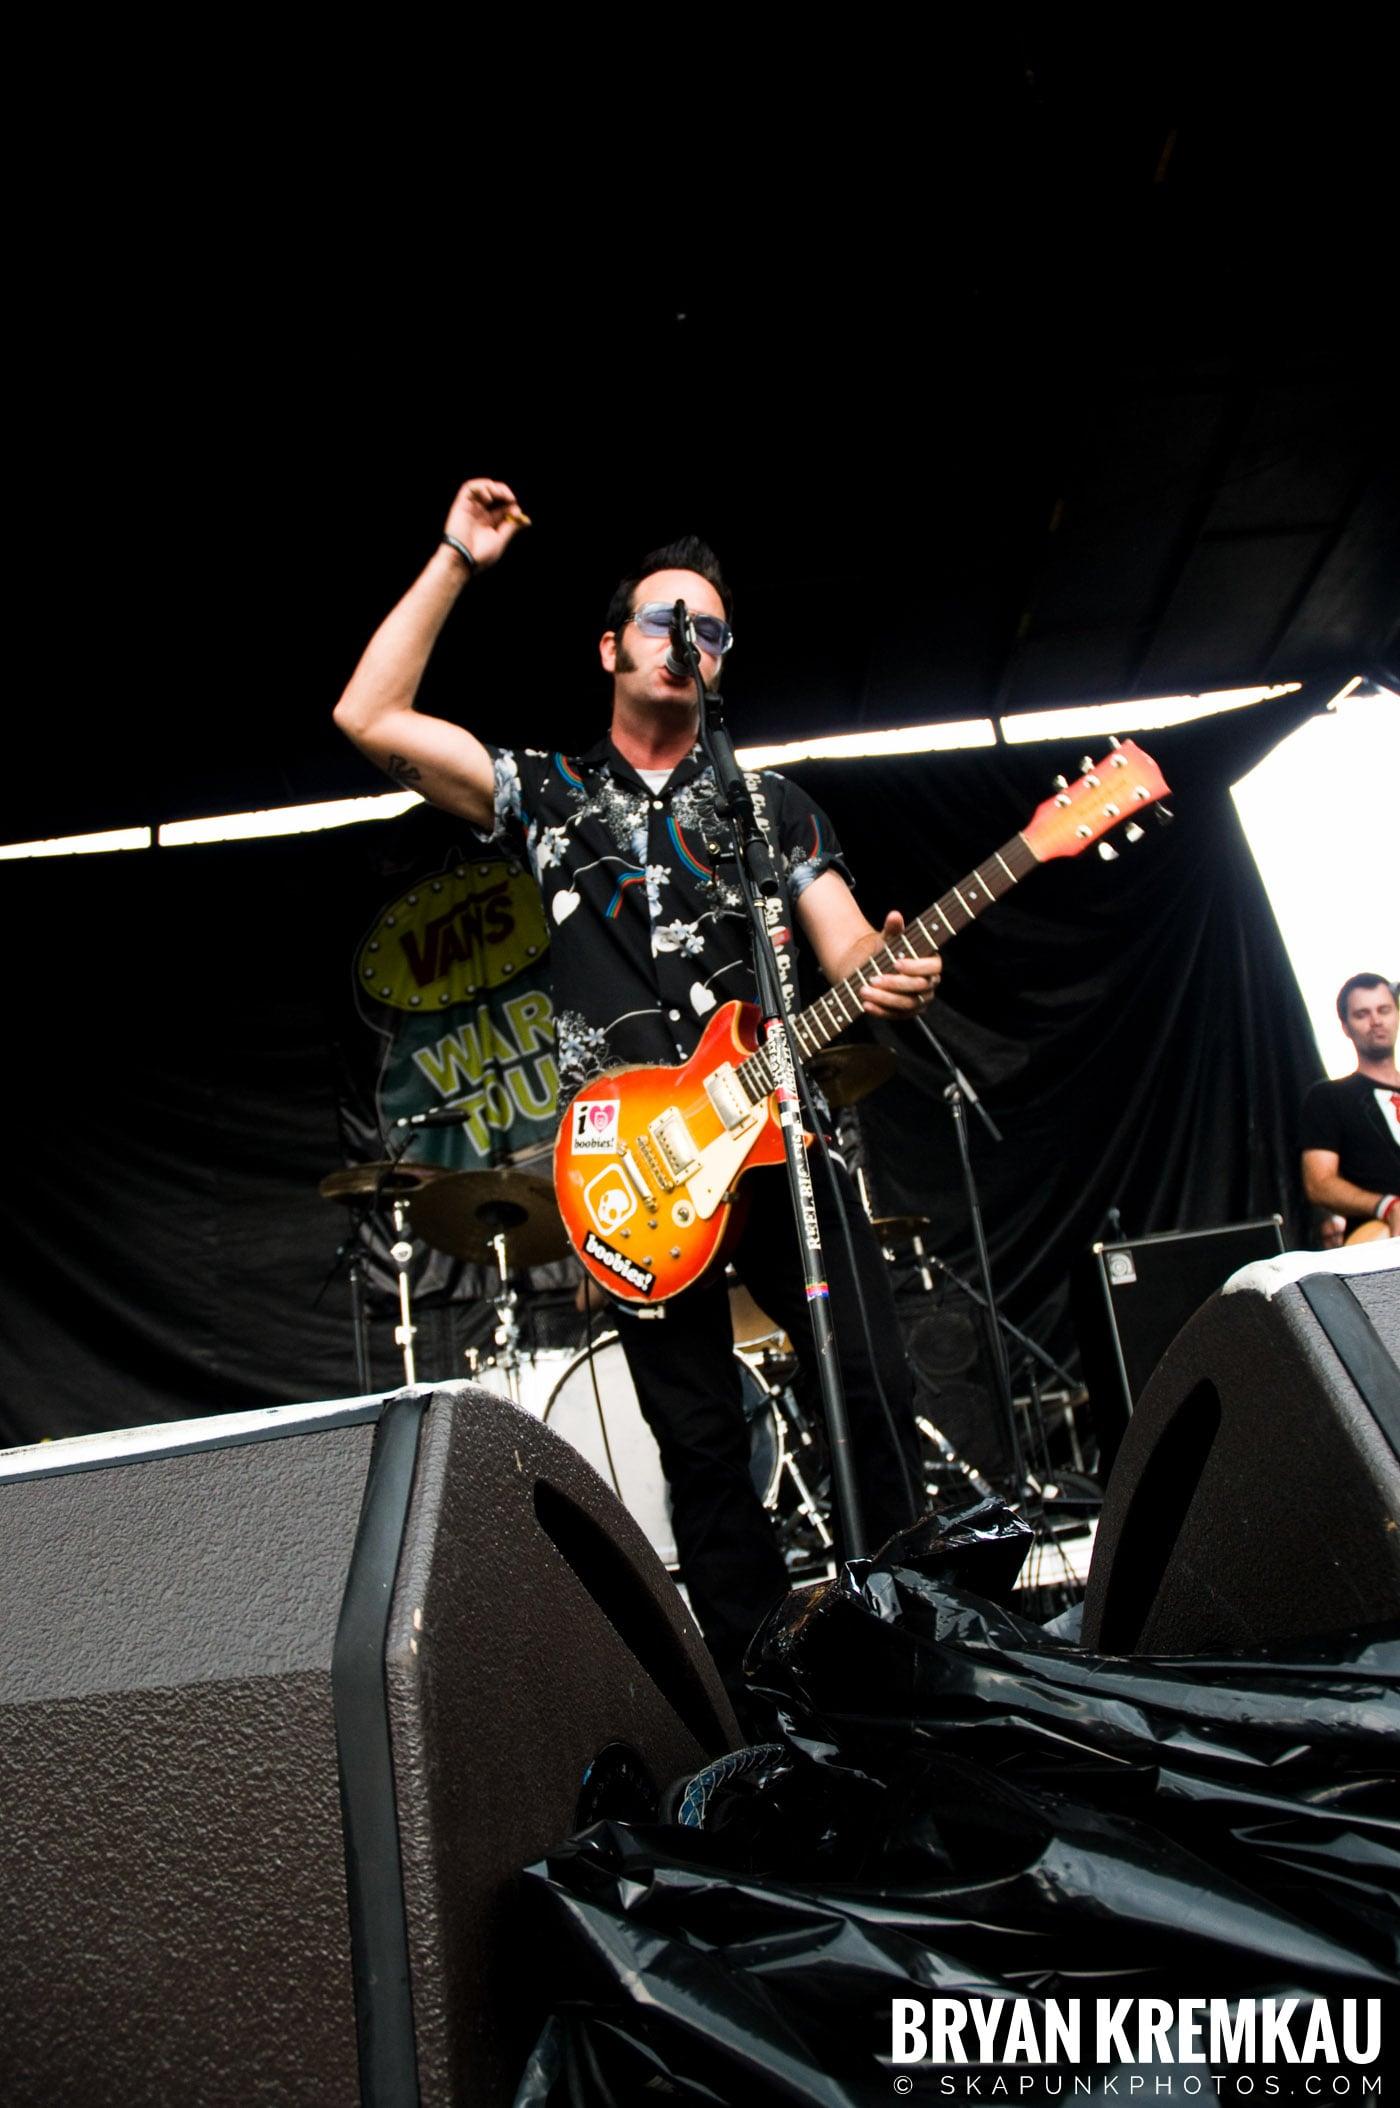 Reel Big Fish @ Warped Tour 08, Scranton PA - 7.27.08 (6)